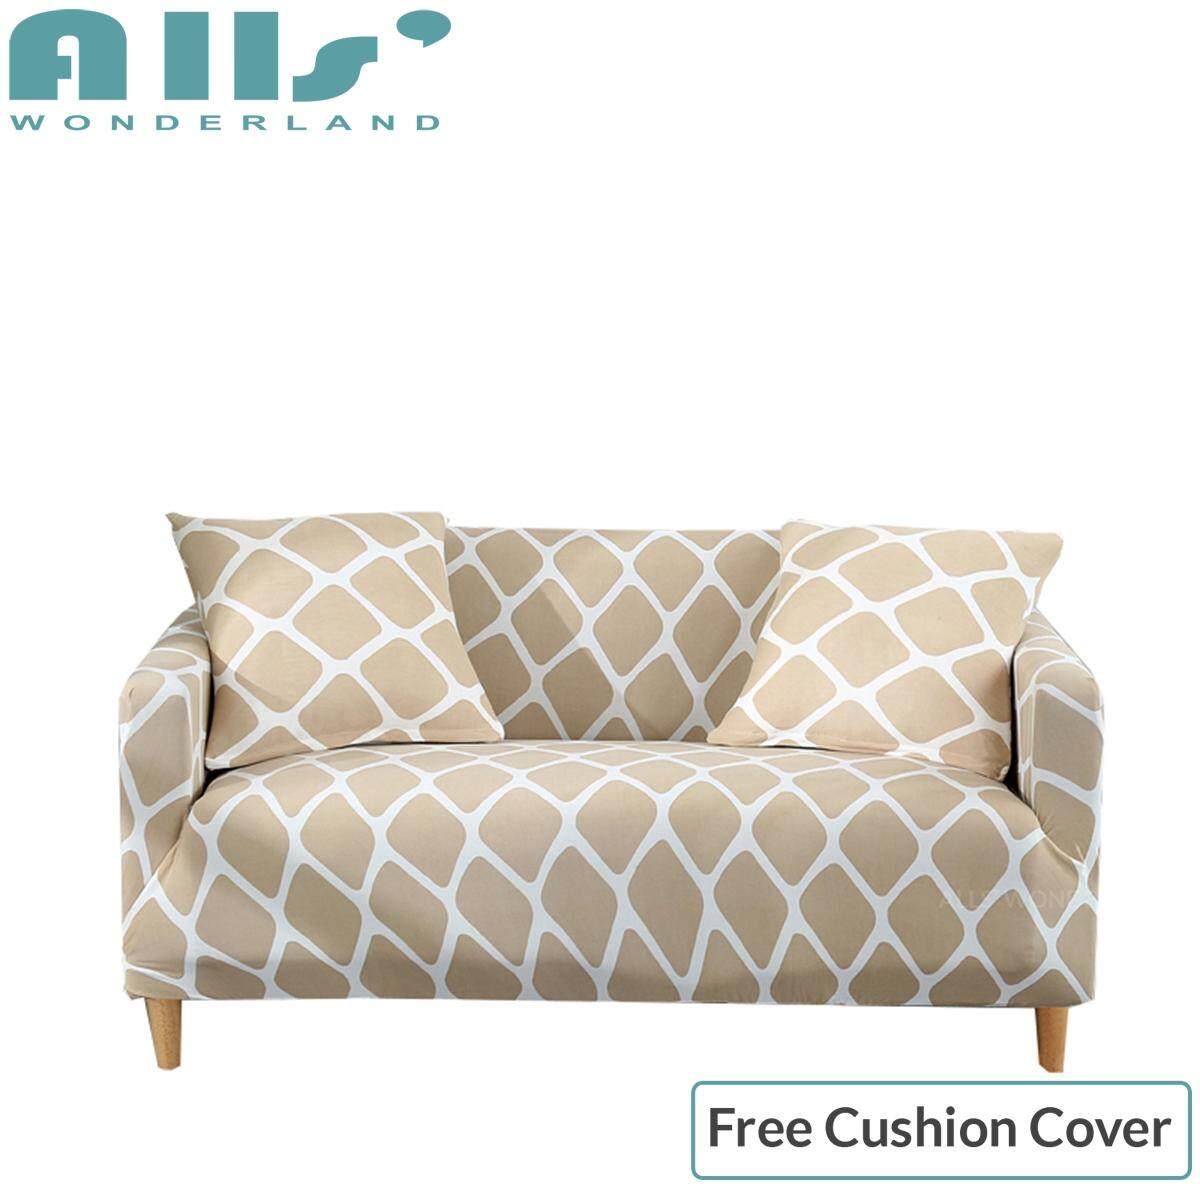 【Slipcover】(3 Seater )Super Elastic Sofa Cover Stretch Sofa Cover 3 Seater Spandex Protector Slipcover Skin-friendly Easy To Install(AGFX)